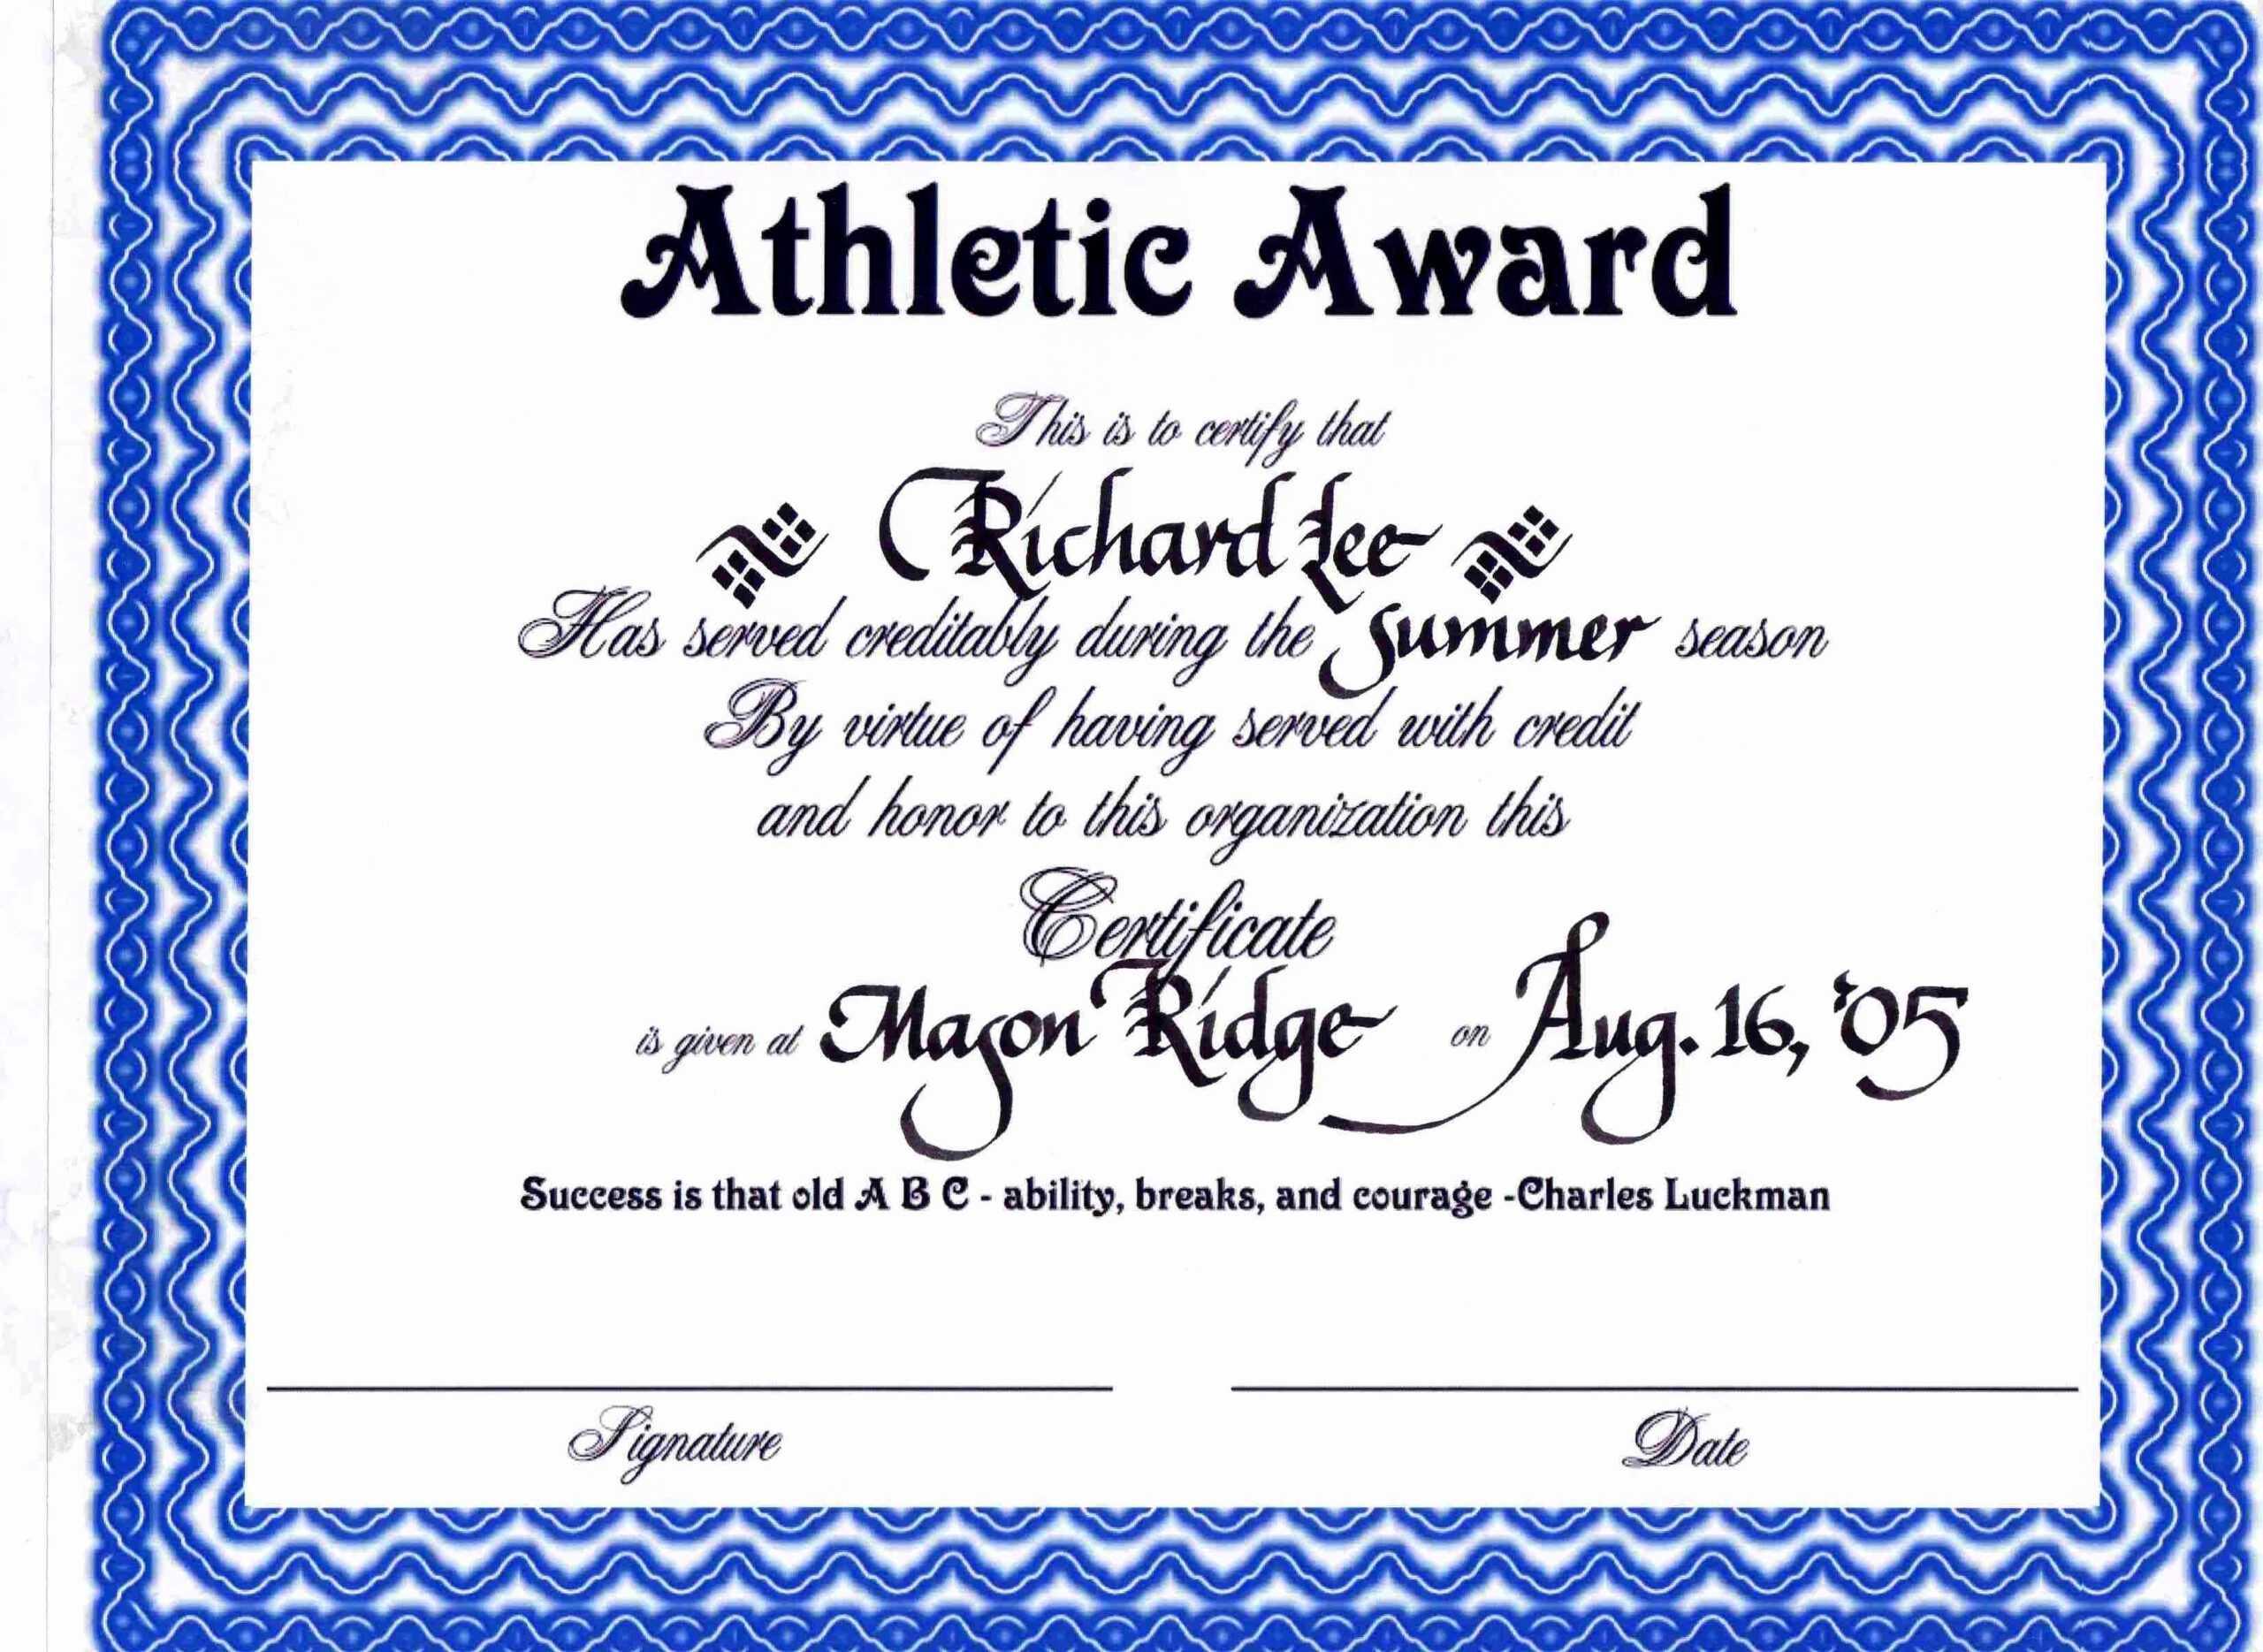 30 Sports Awards Certificate Template | Pryncepality throughout Sports Award Certificate Template Word